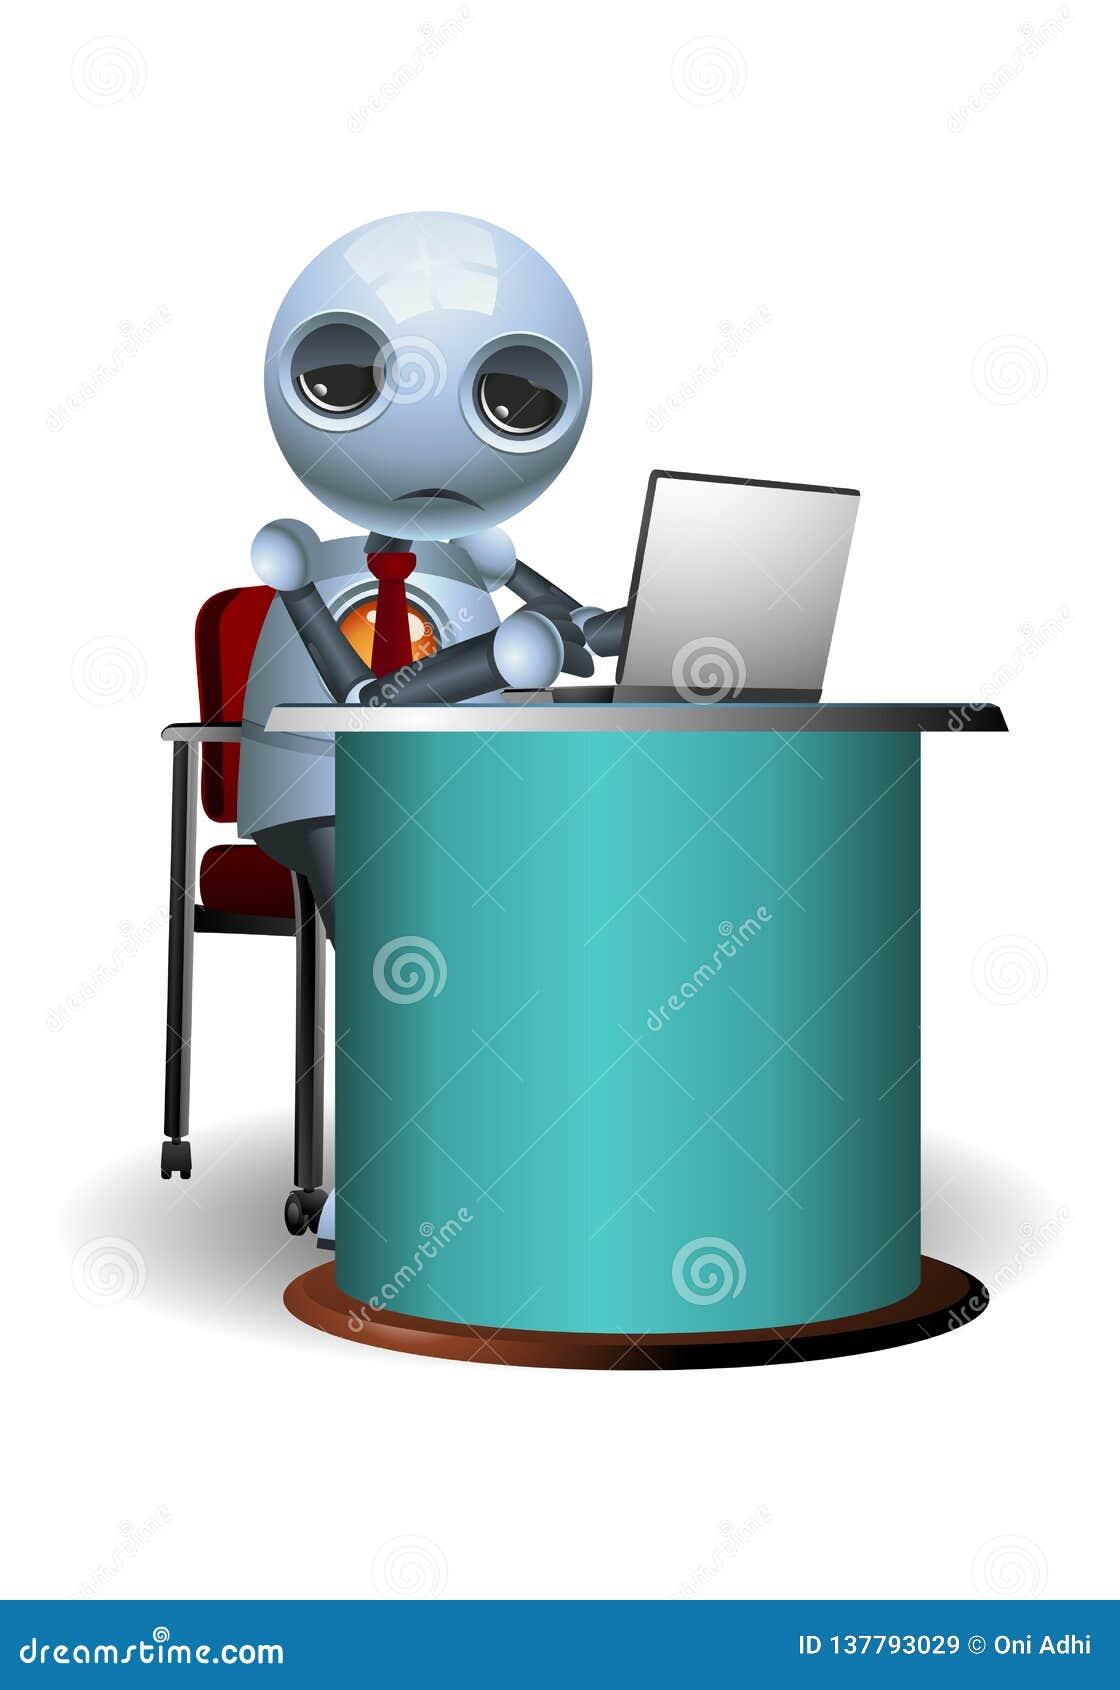 Little robot tired of work